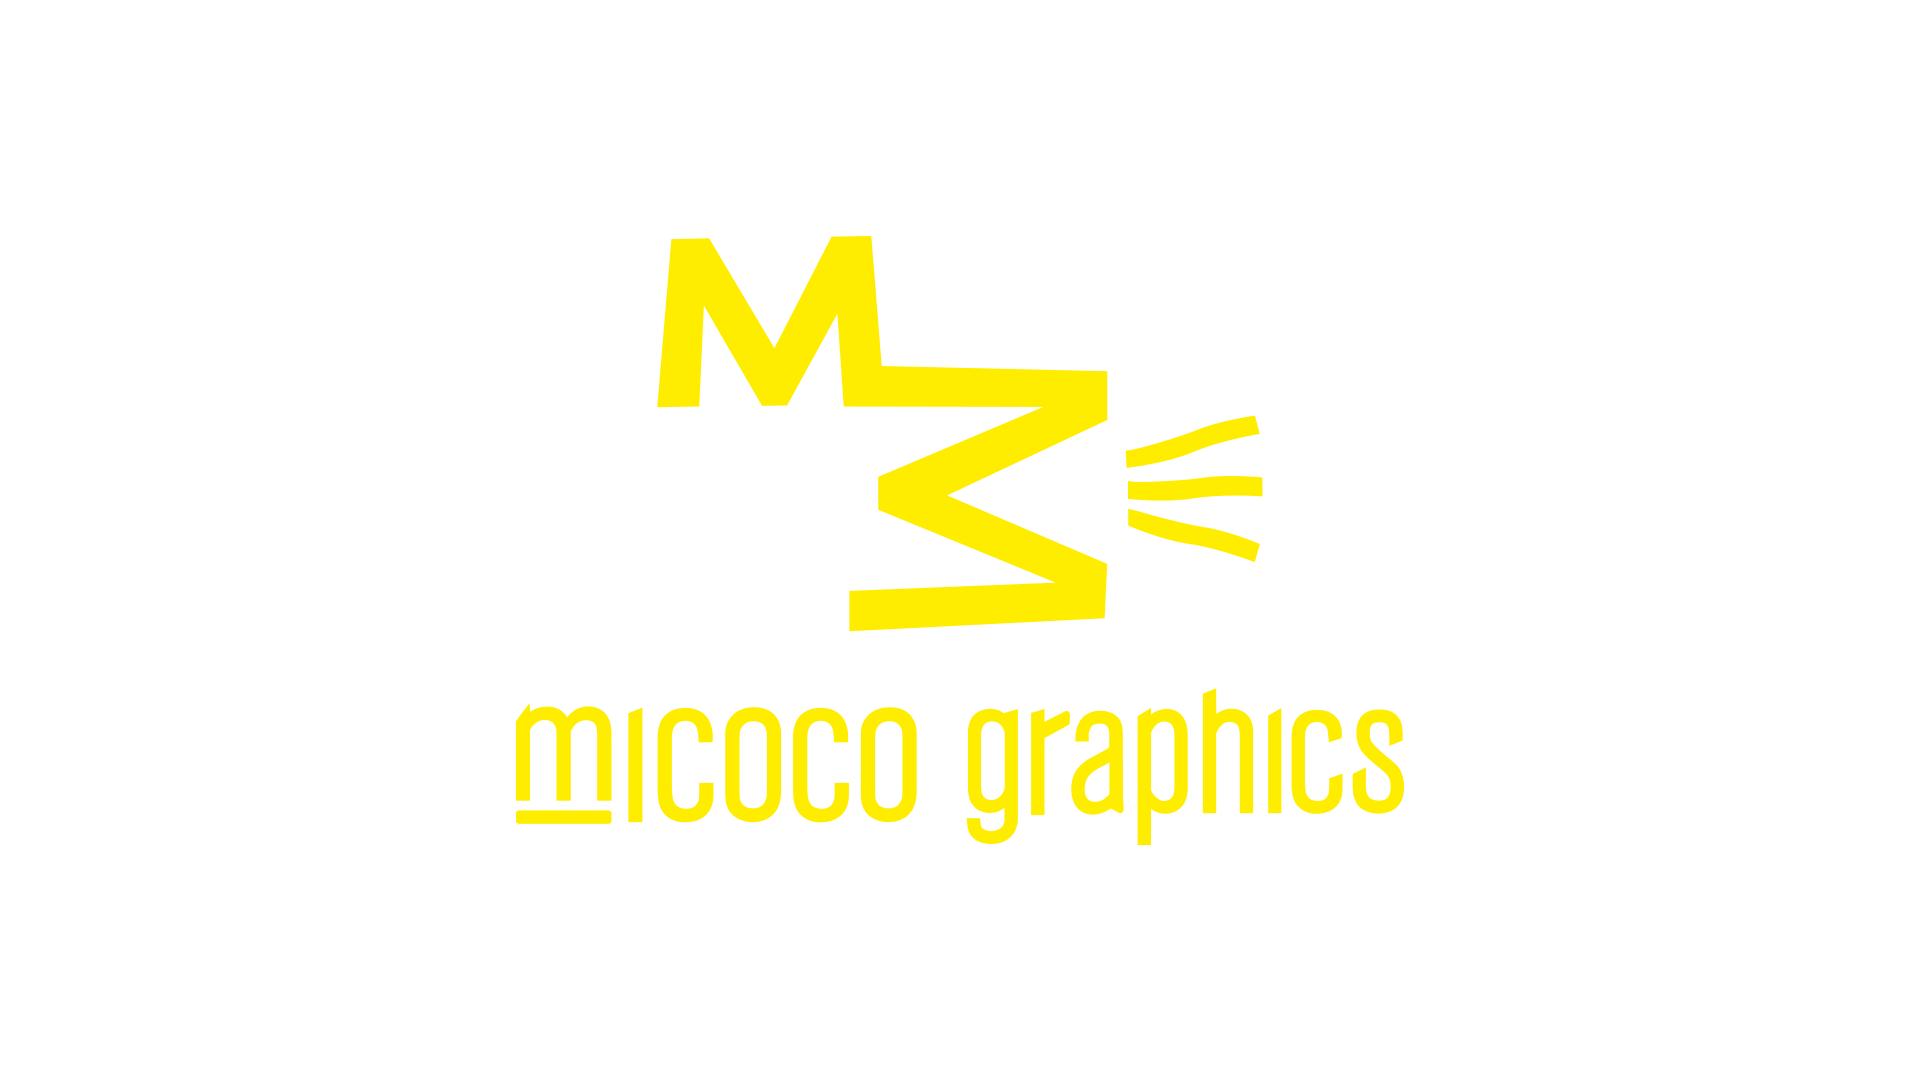 Micoco Graphics